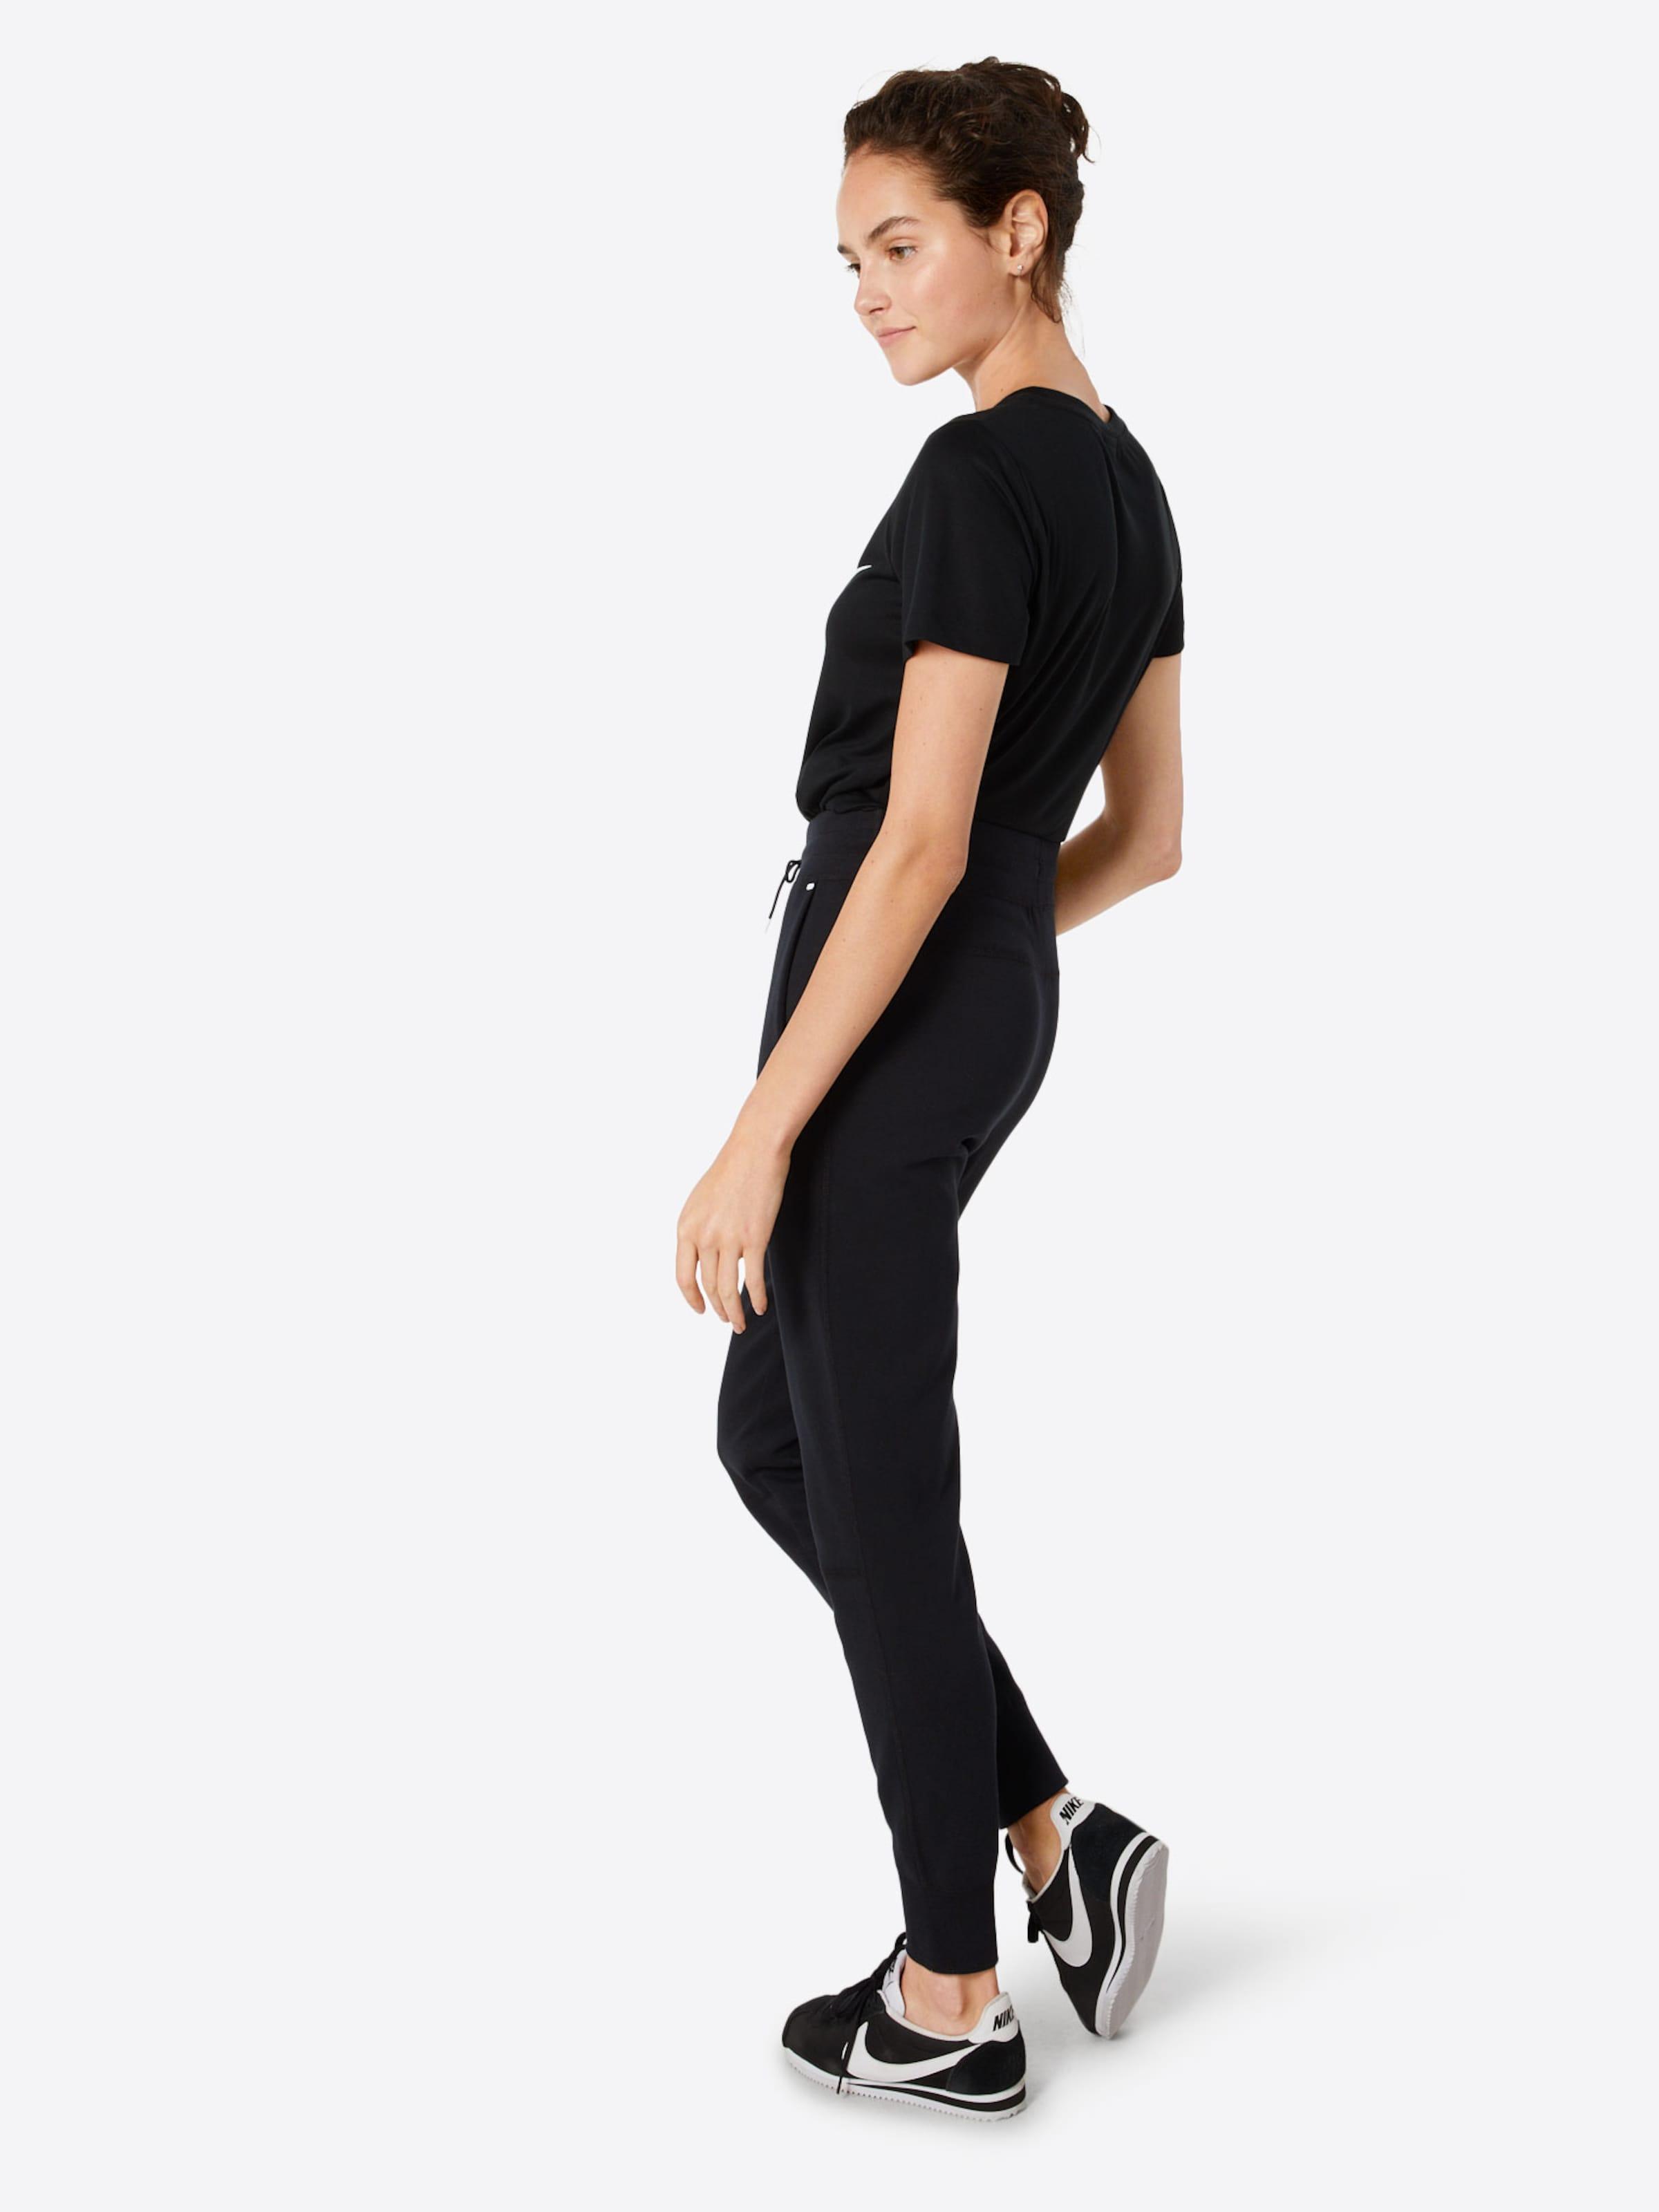 Pantalon En Sportswear NoirBlanc En Nike Pantalon Sportswear Nike OiXTPukZ